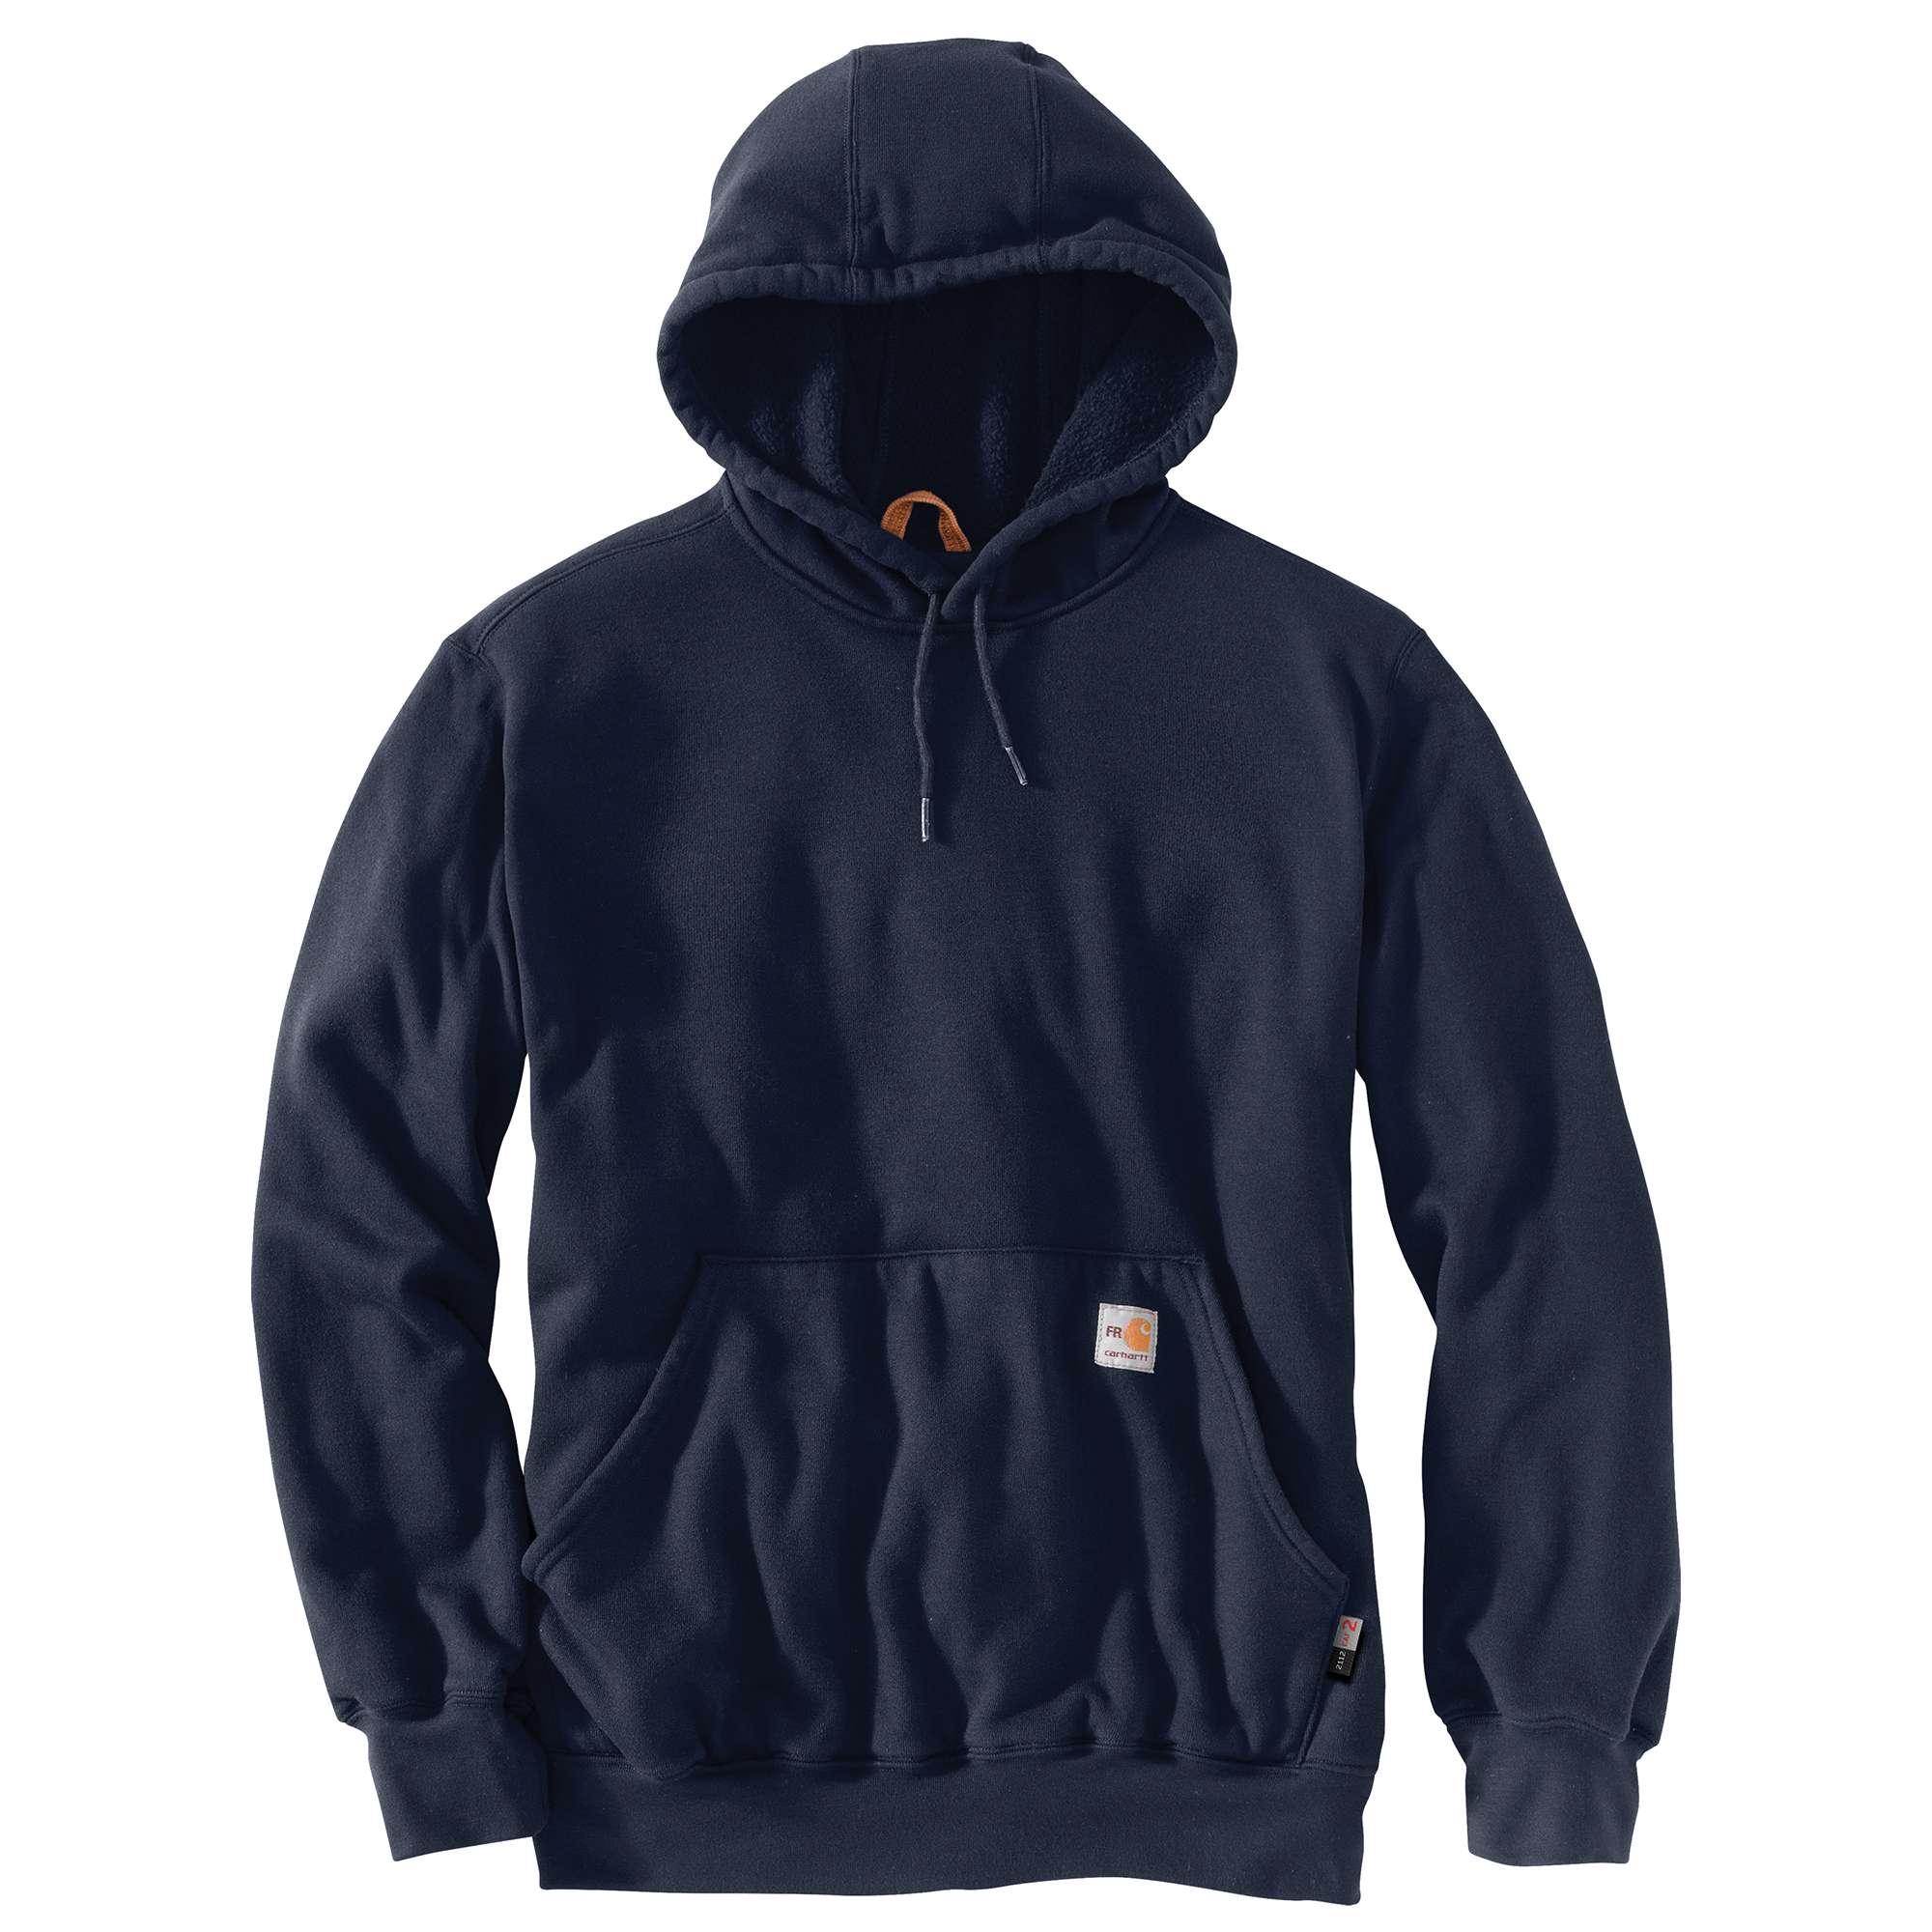 Carhartt - FR HW Hooded Sweatshirt-Carhartt